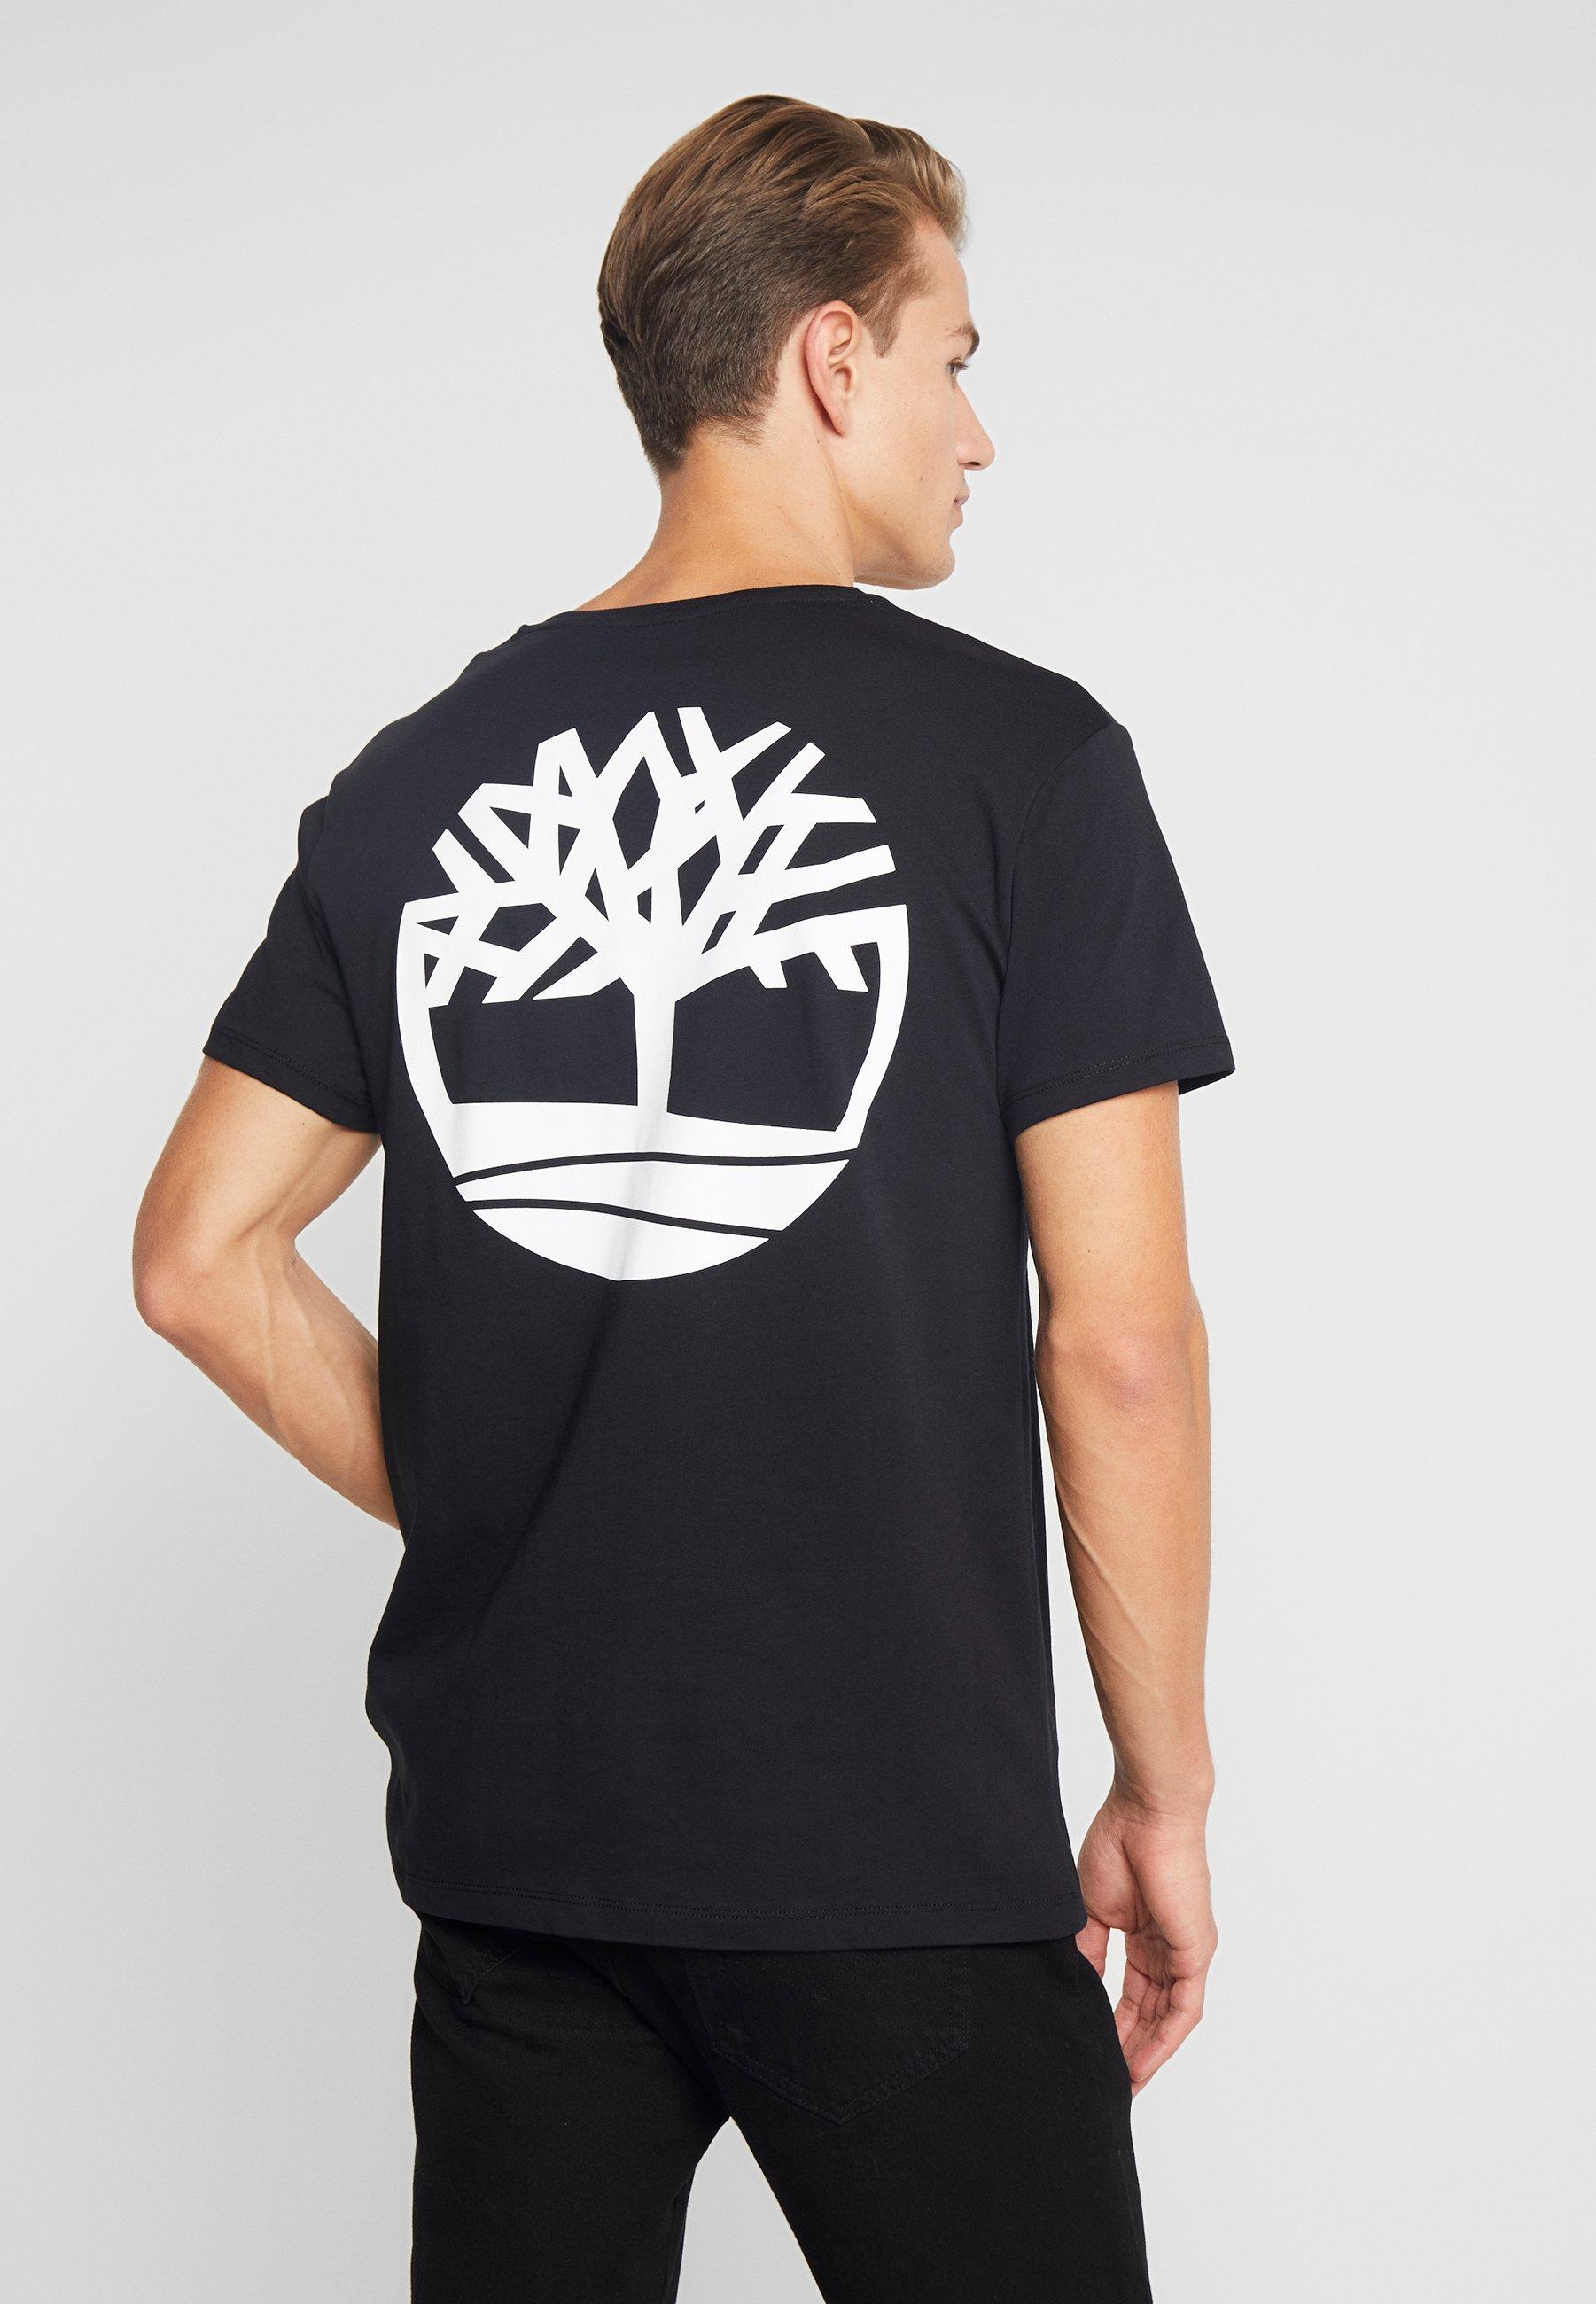 TeeT Stampa shirt Black Logo Timberland Con CBdoxe